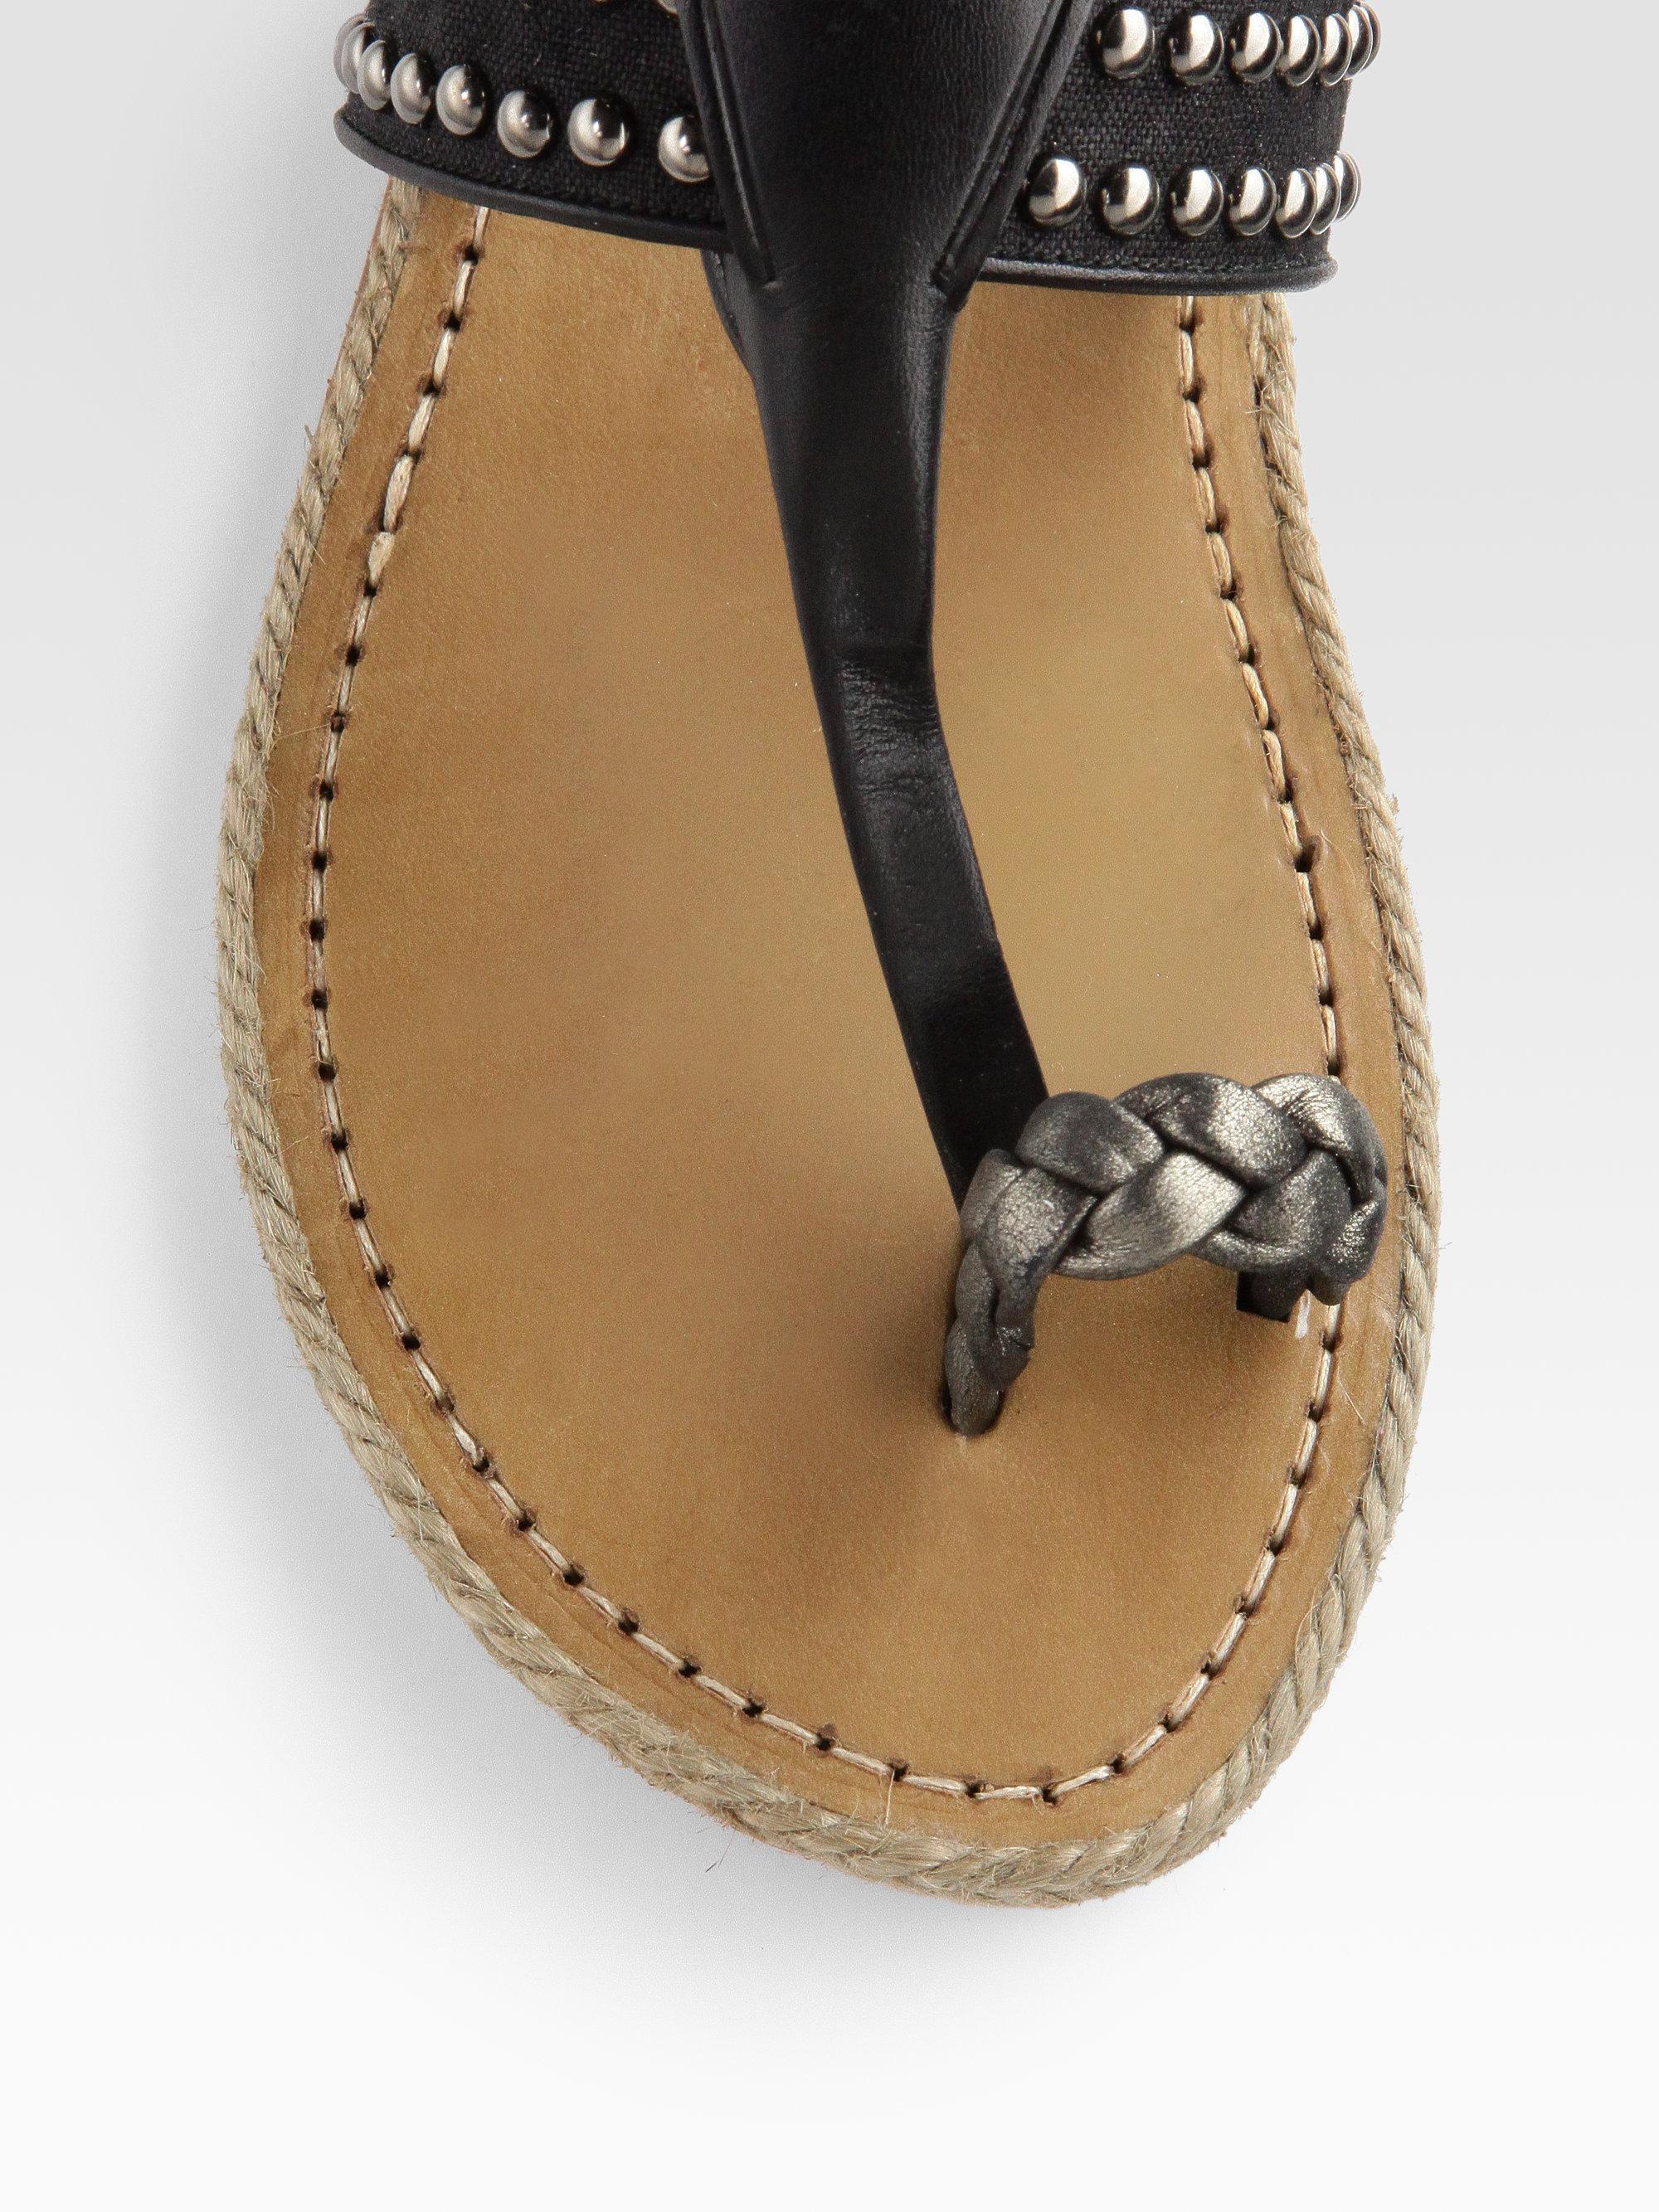 louboutin flat gladiator sandals